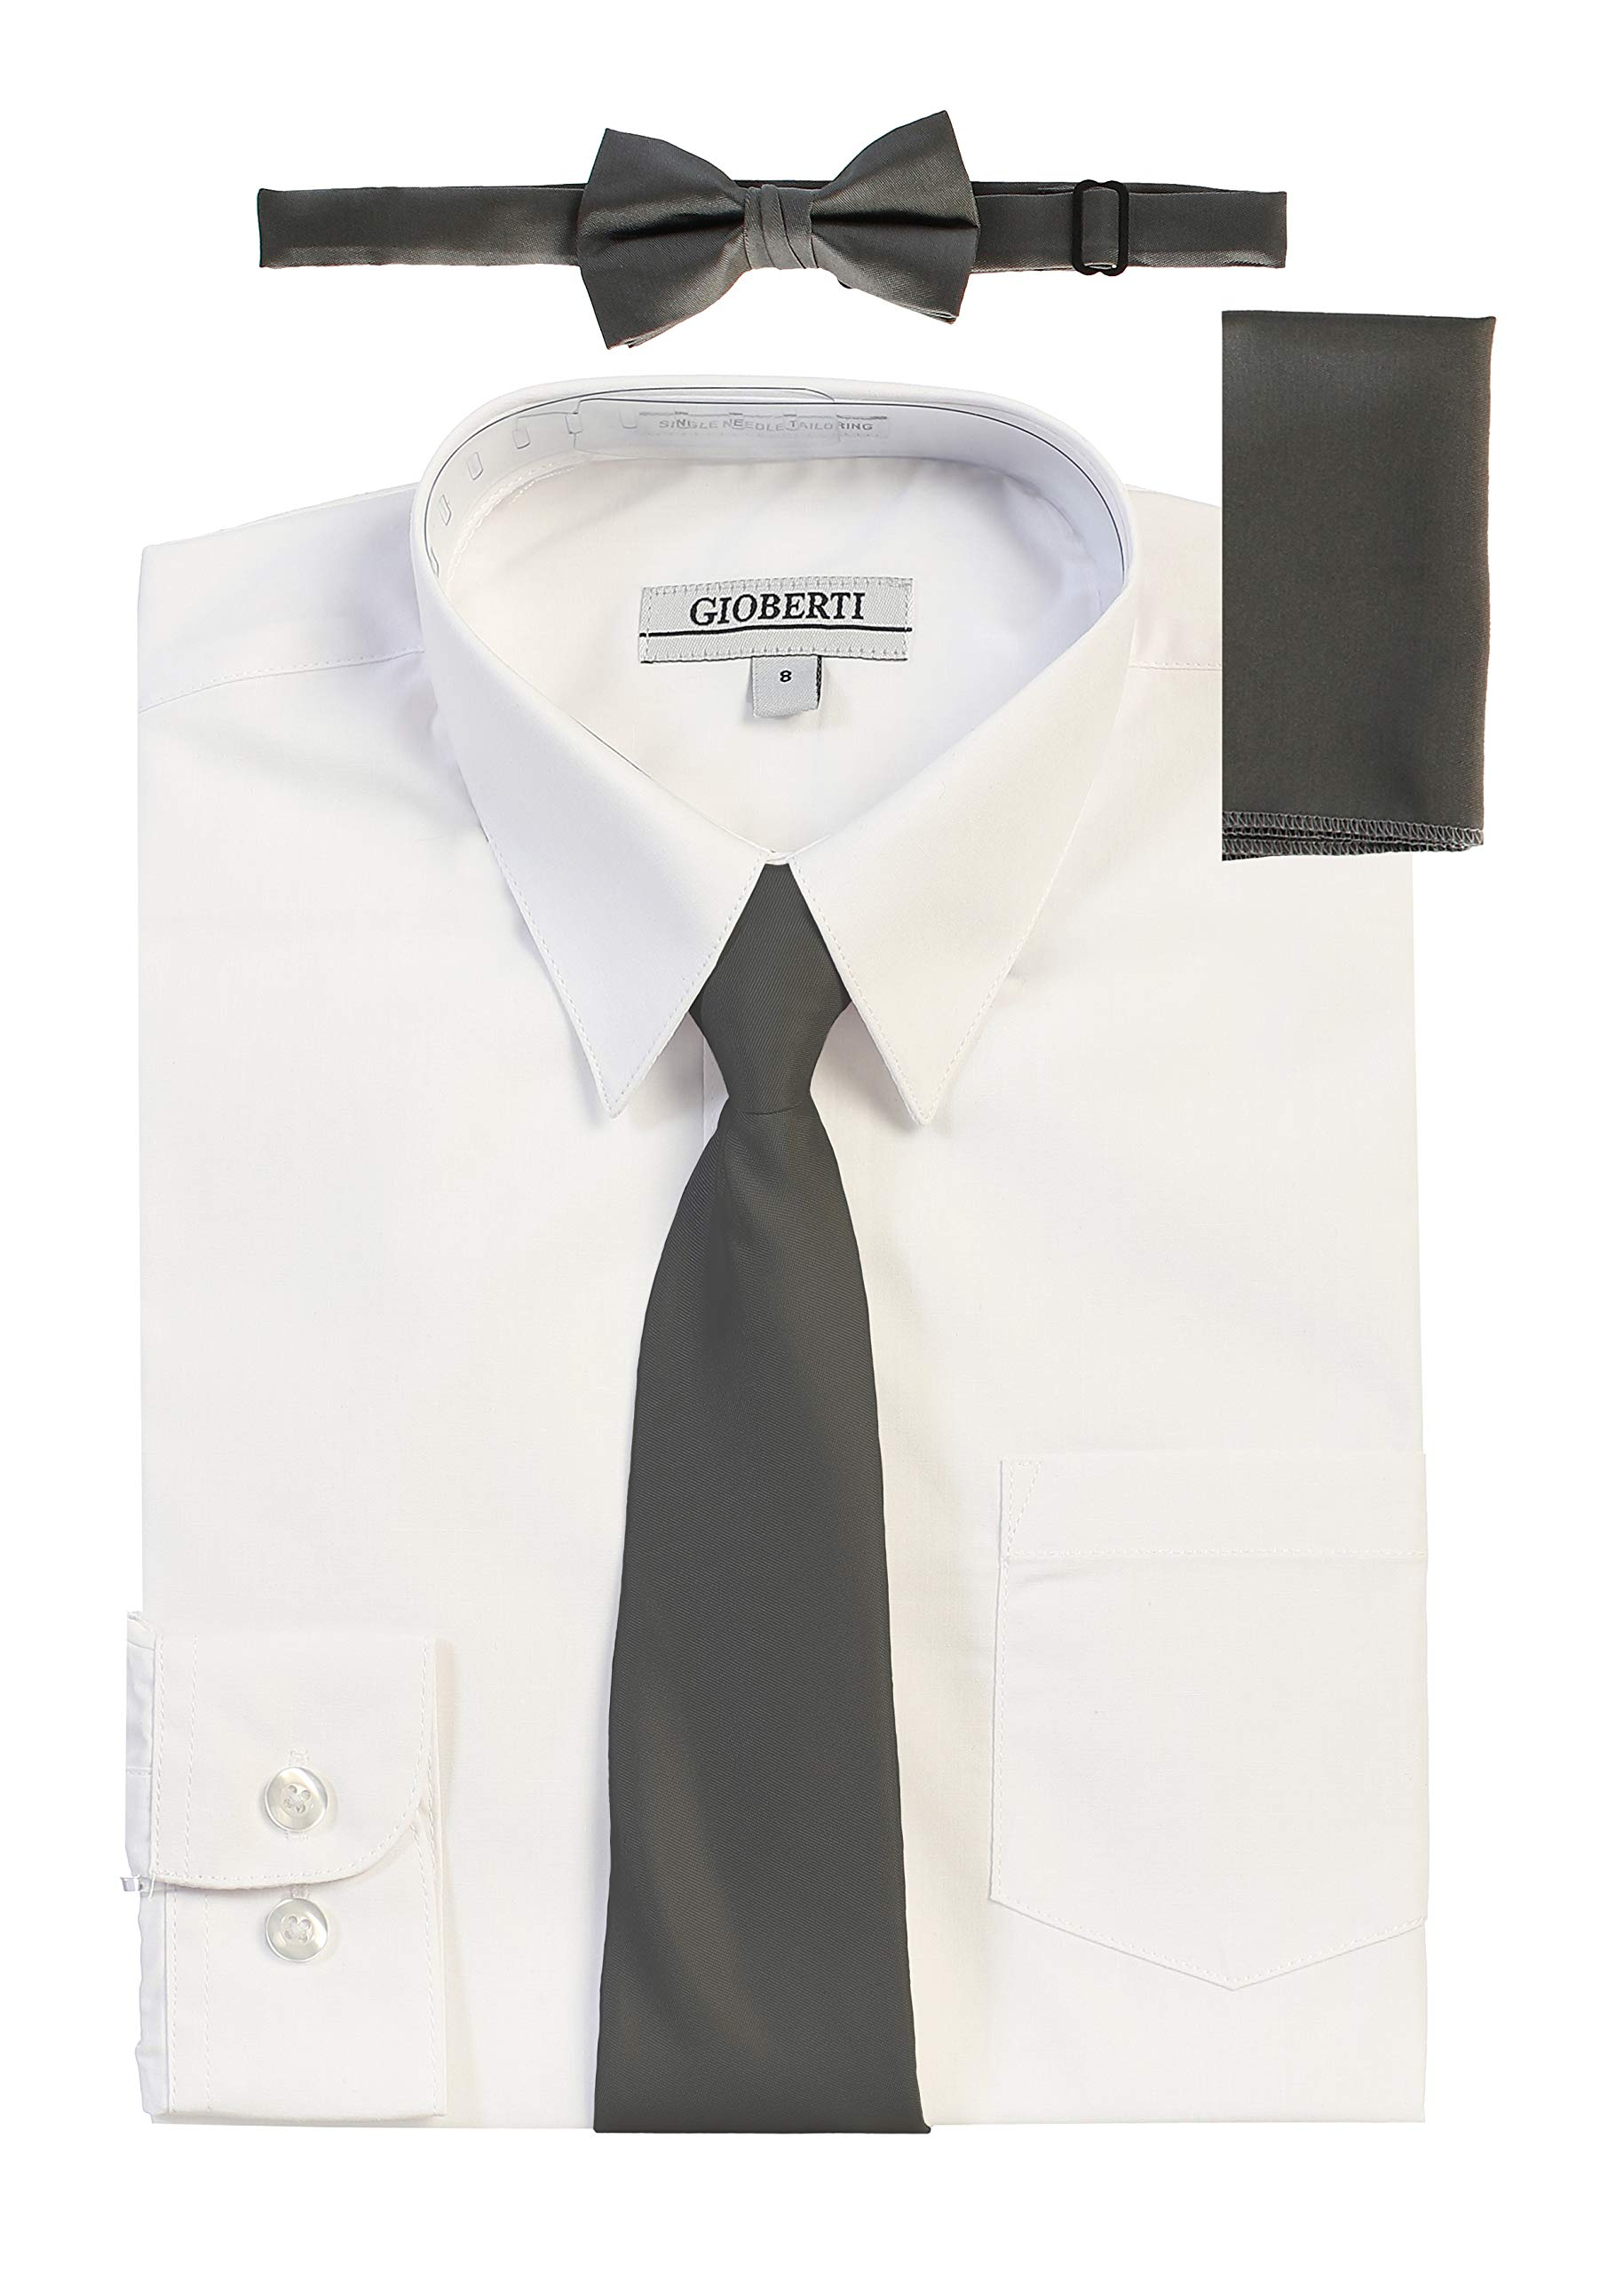 Gioberti Boy's Long Sleeve White Dress Shirt with Dark Gray Zippered Tie, Bow Tie, and Handkerchief Set, Size 8